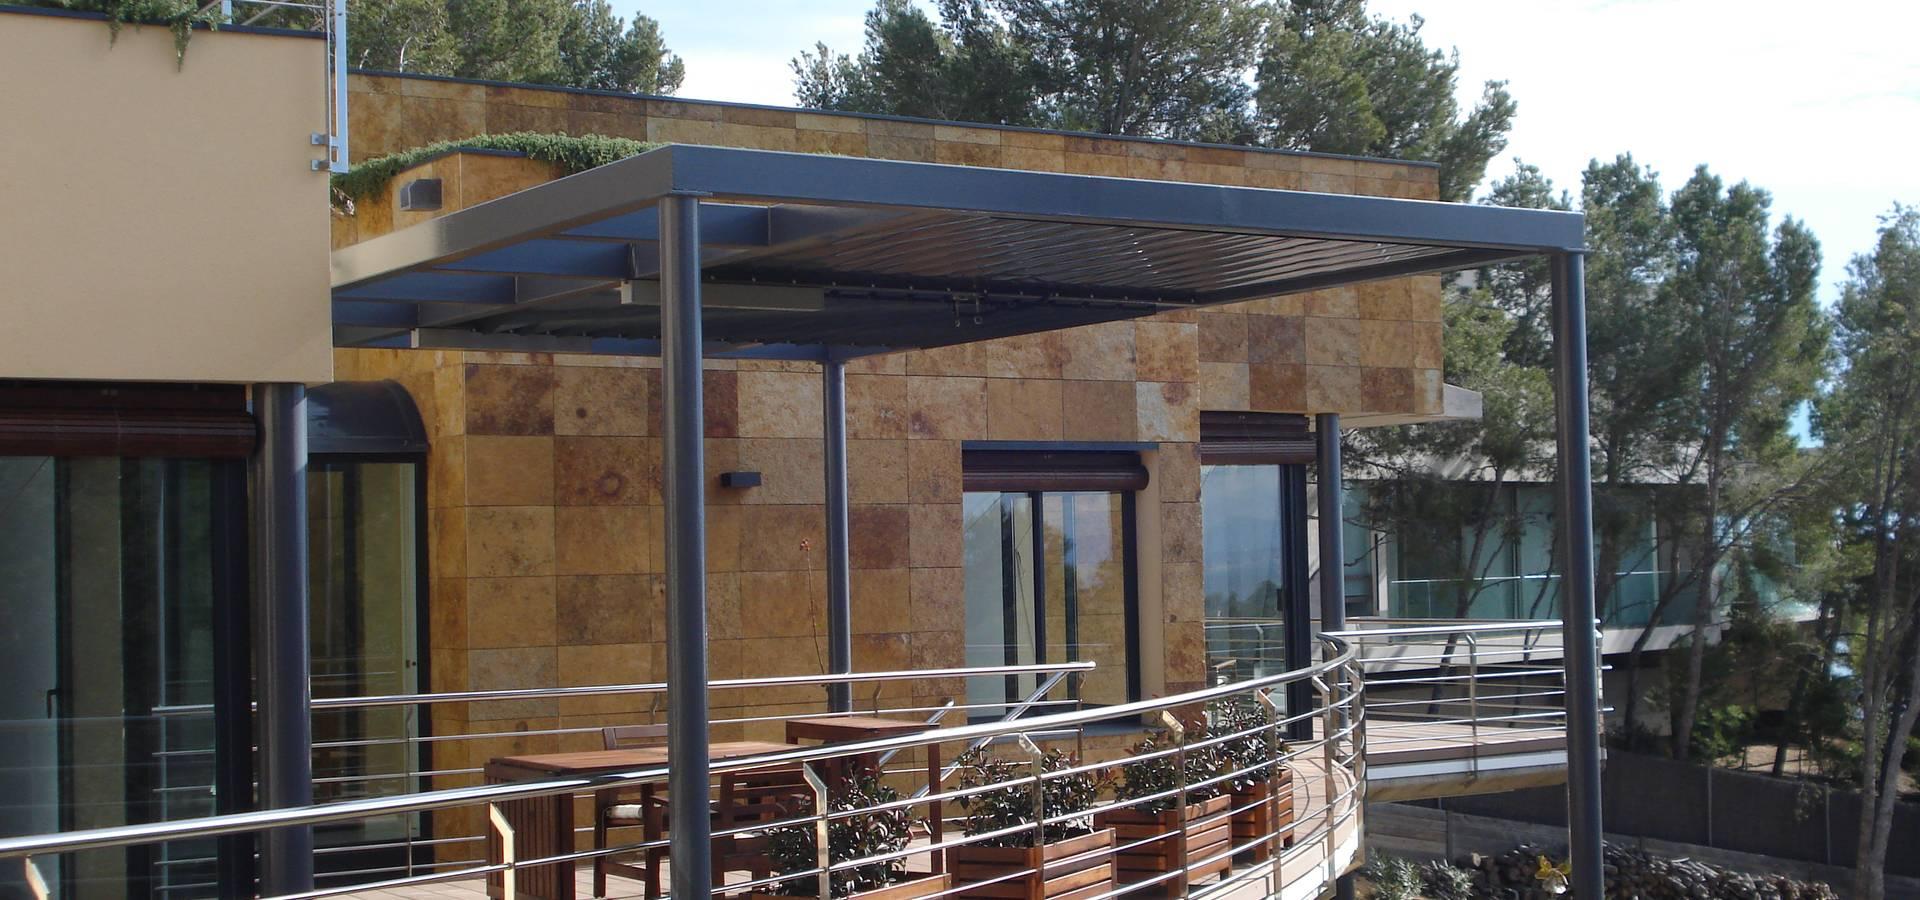 Estudi d 39 arquitectura xavier climent arquitectos en - Arquitectos tarragona ...